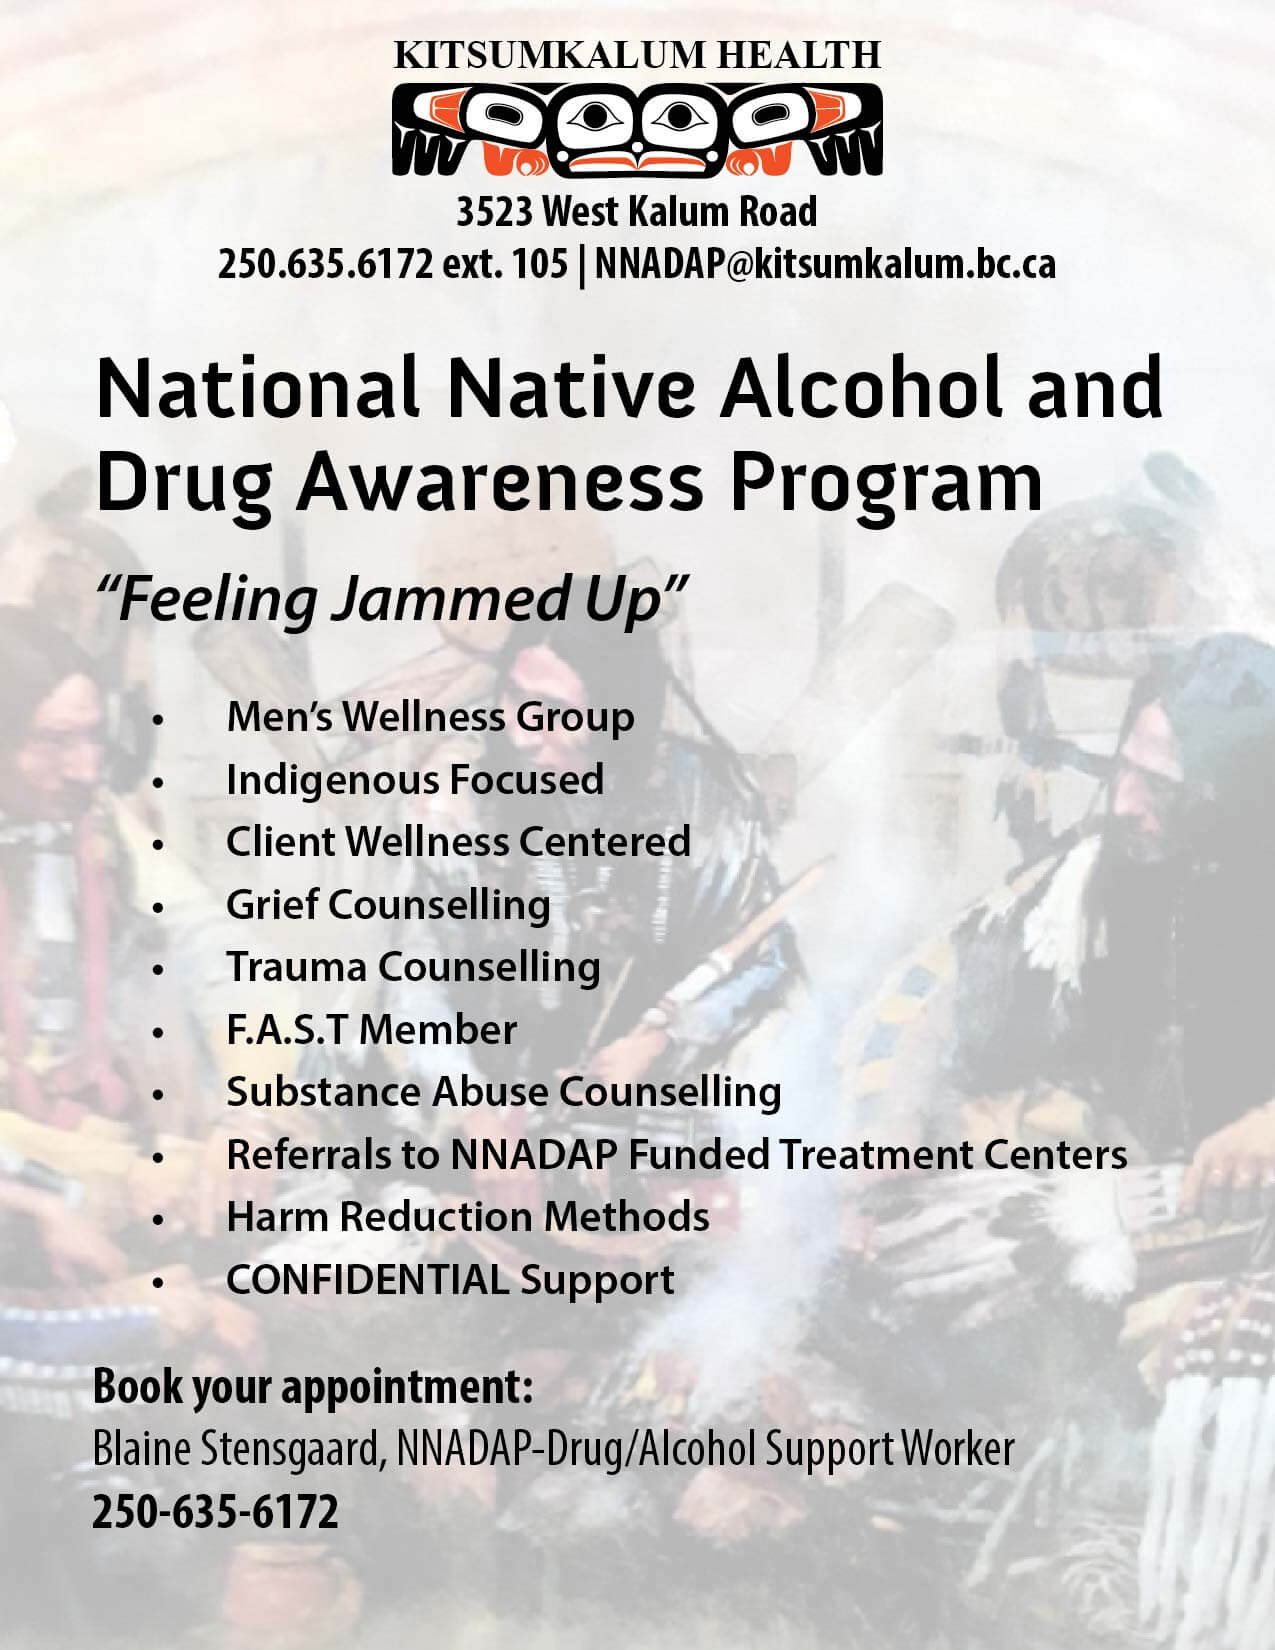 Kitsumkalum Health NNADAP Services